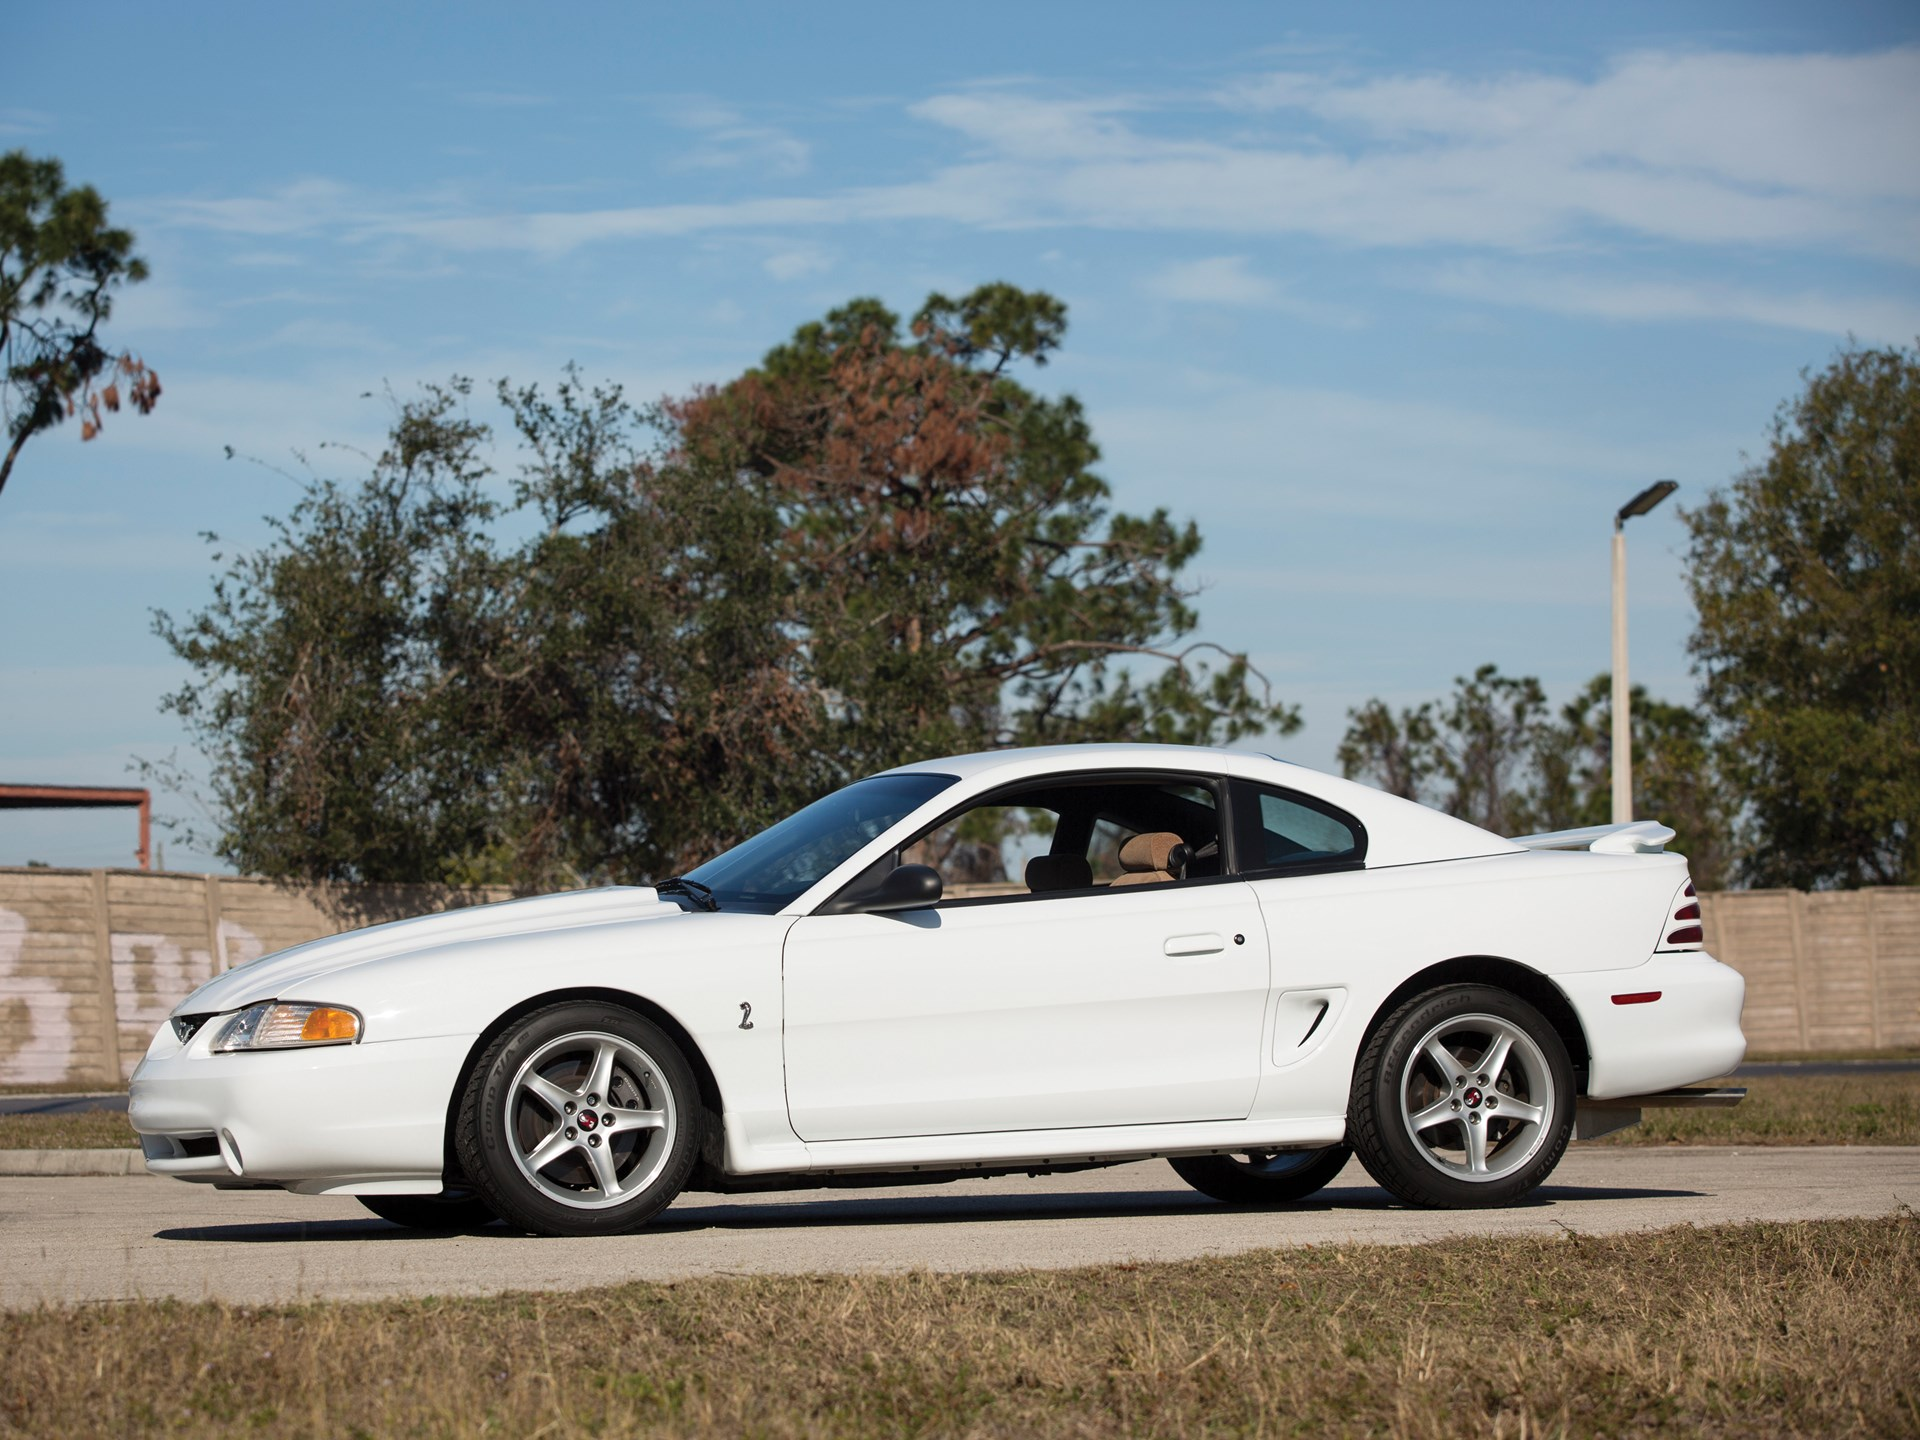 1995 Ford Mustang SVT Cobra R side profile